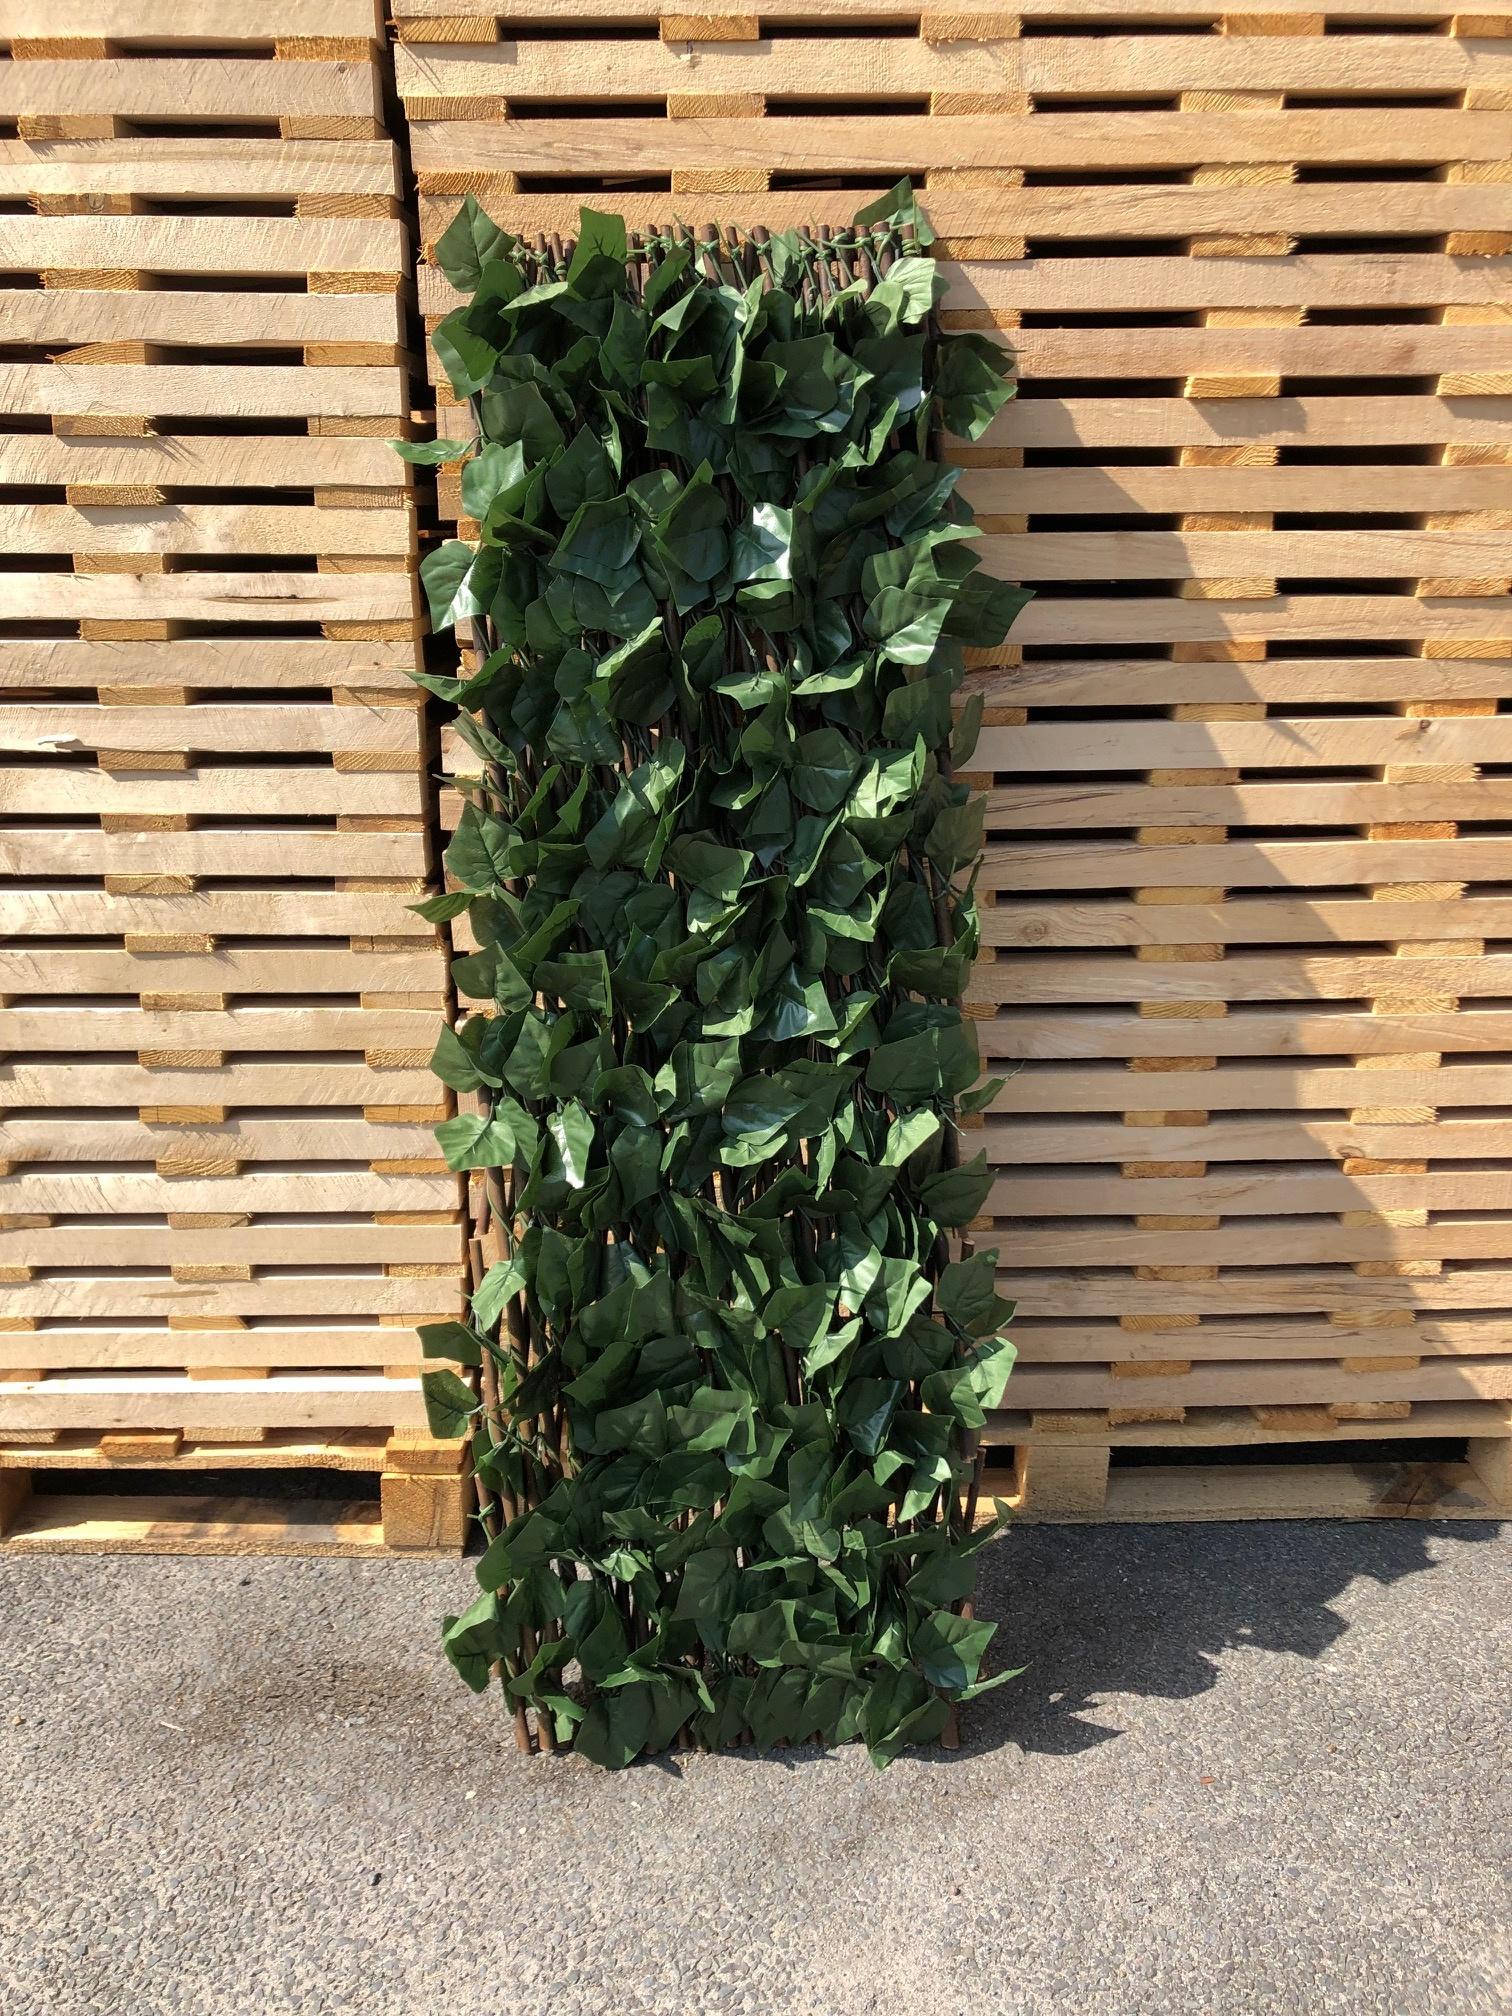 TuinChamp Willow trellis with plastic leaves